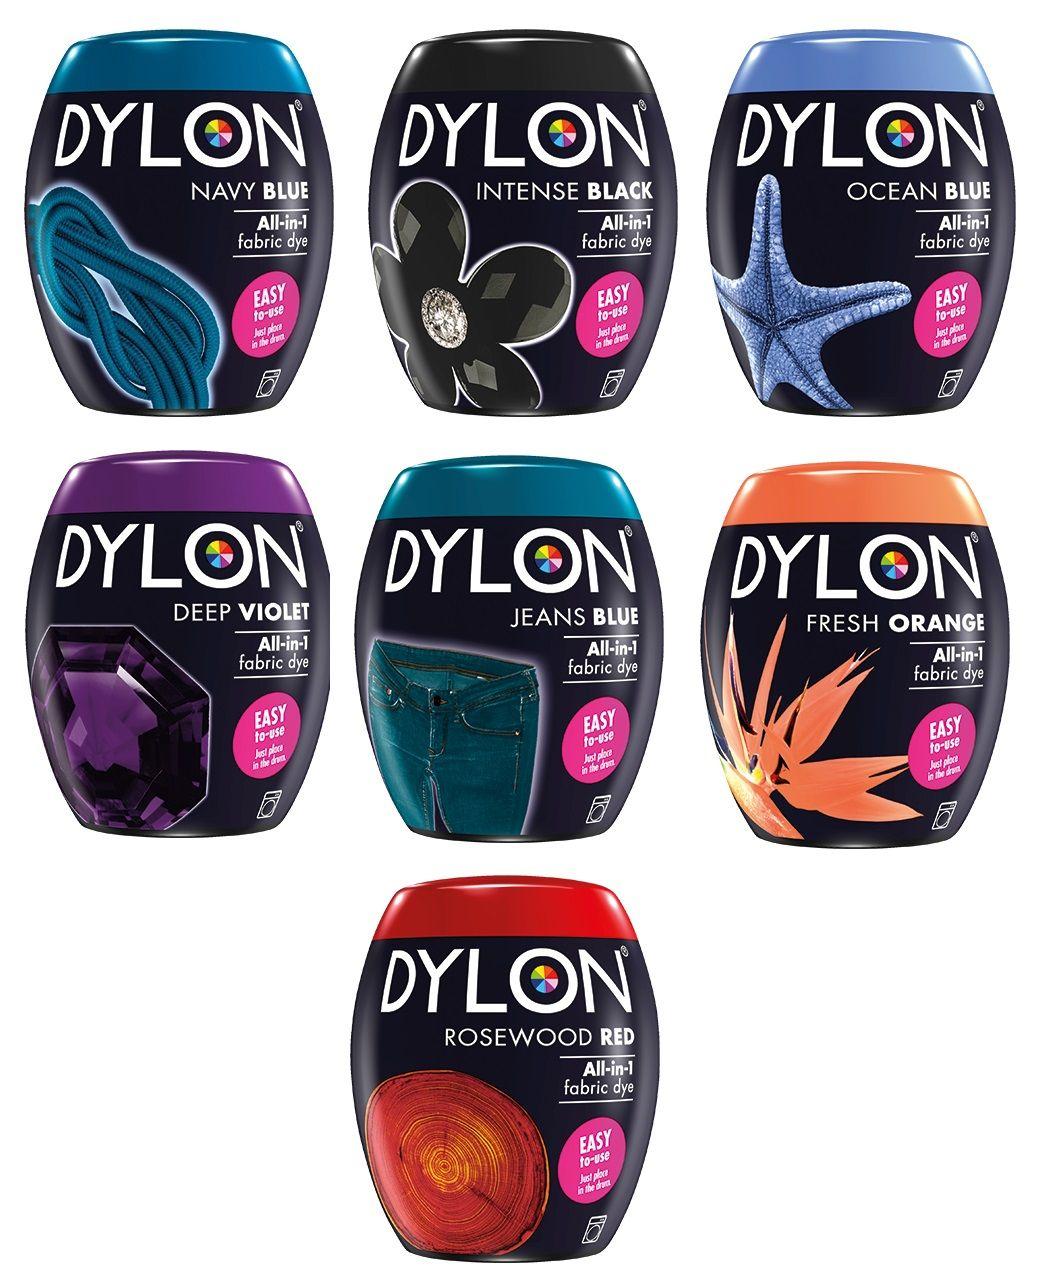 A00129 Dylon Fabric Dye Pods for Washing Machine - Full ...